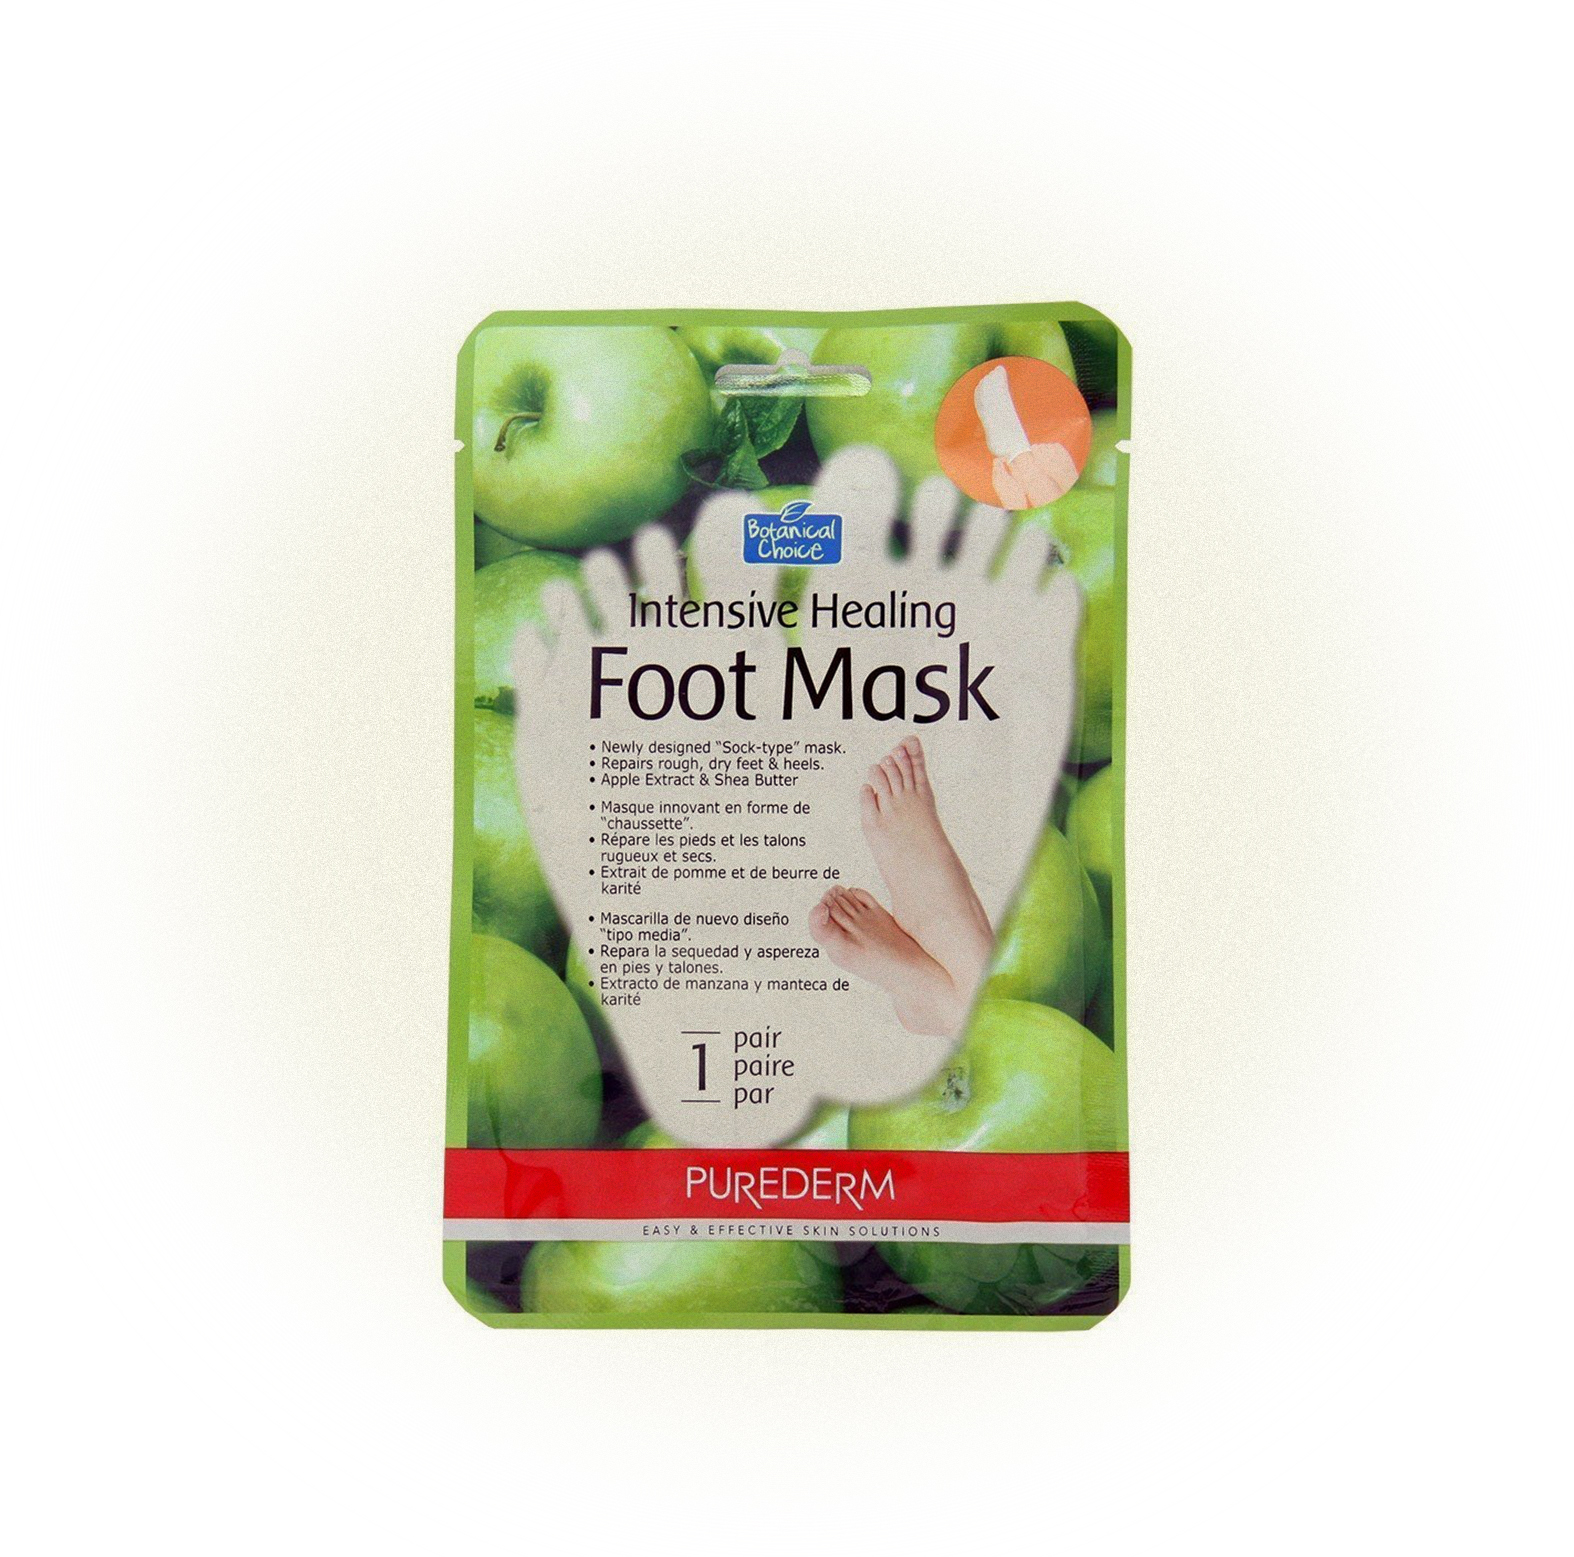 Восстанавливающая Intensive healing Foot Mask, Purederm